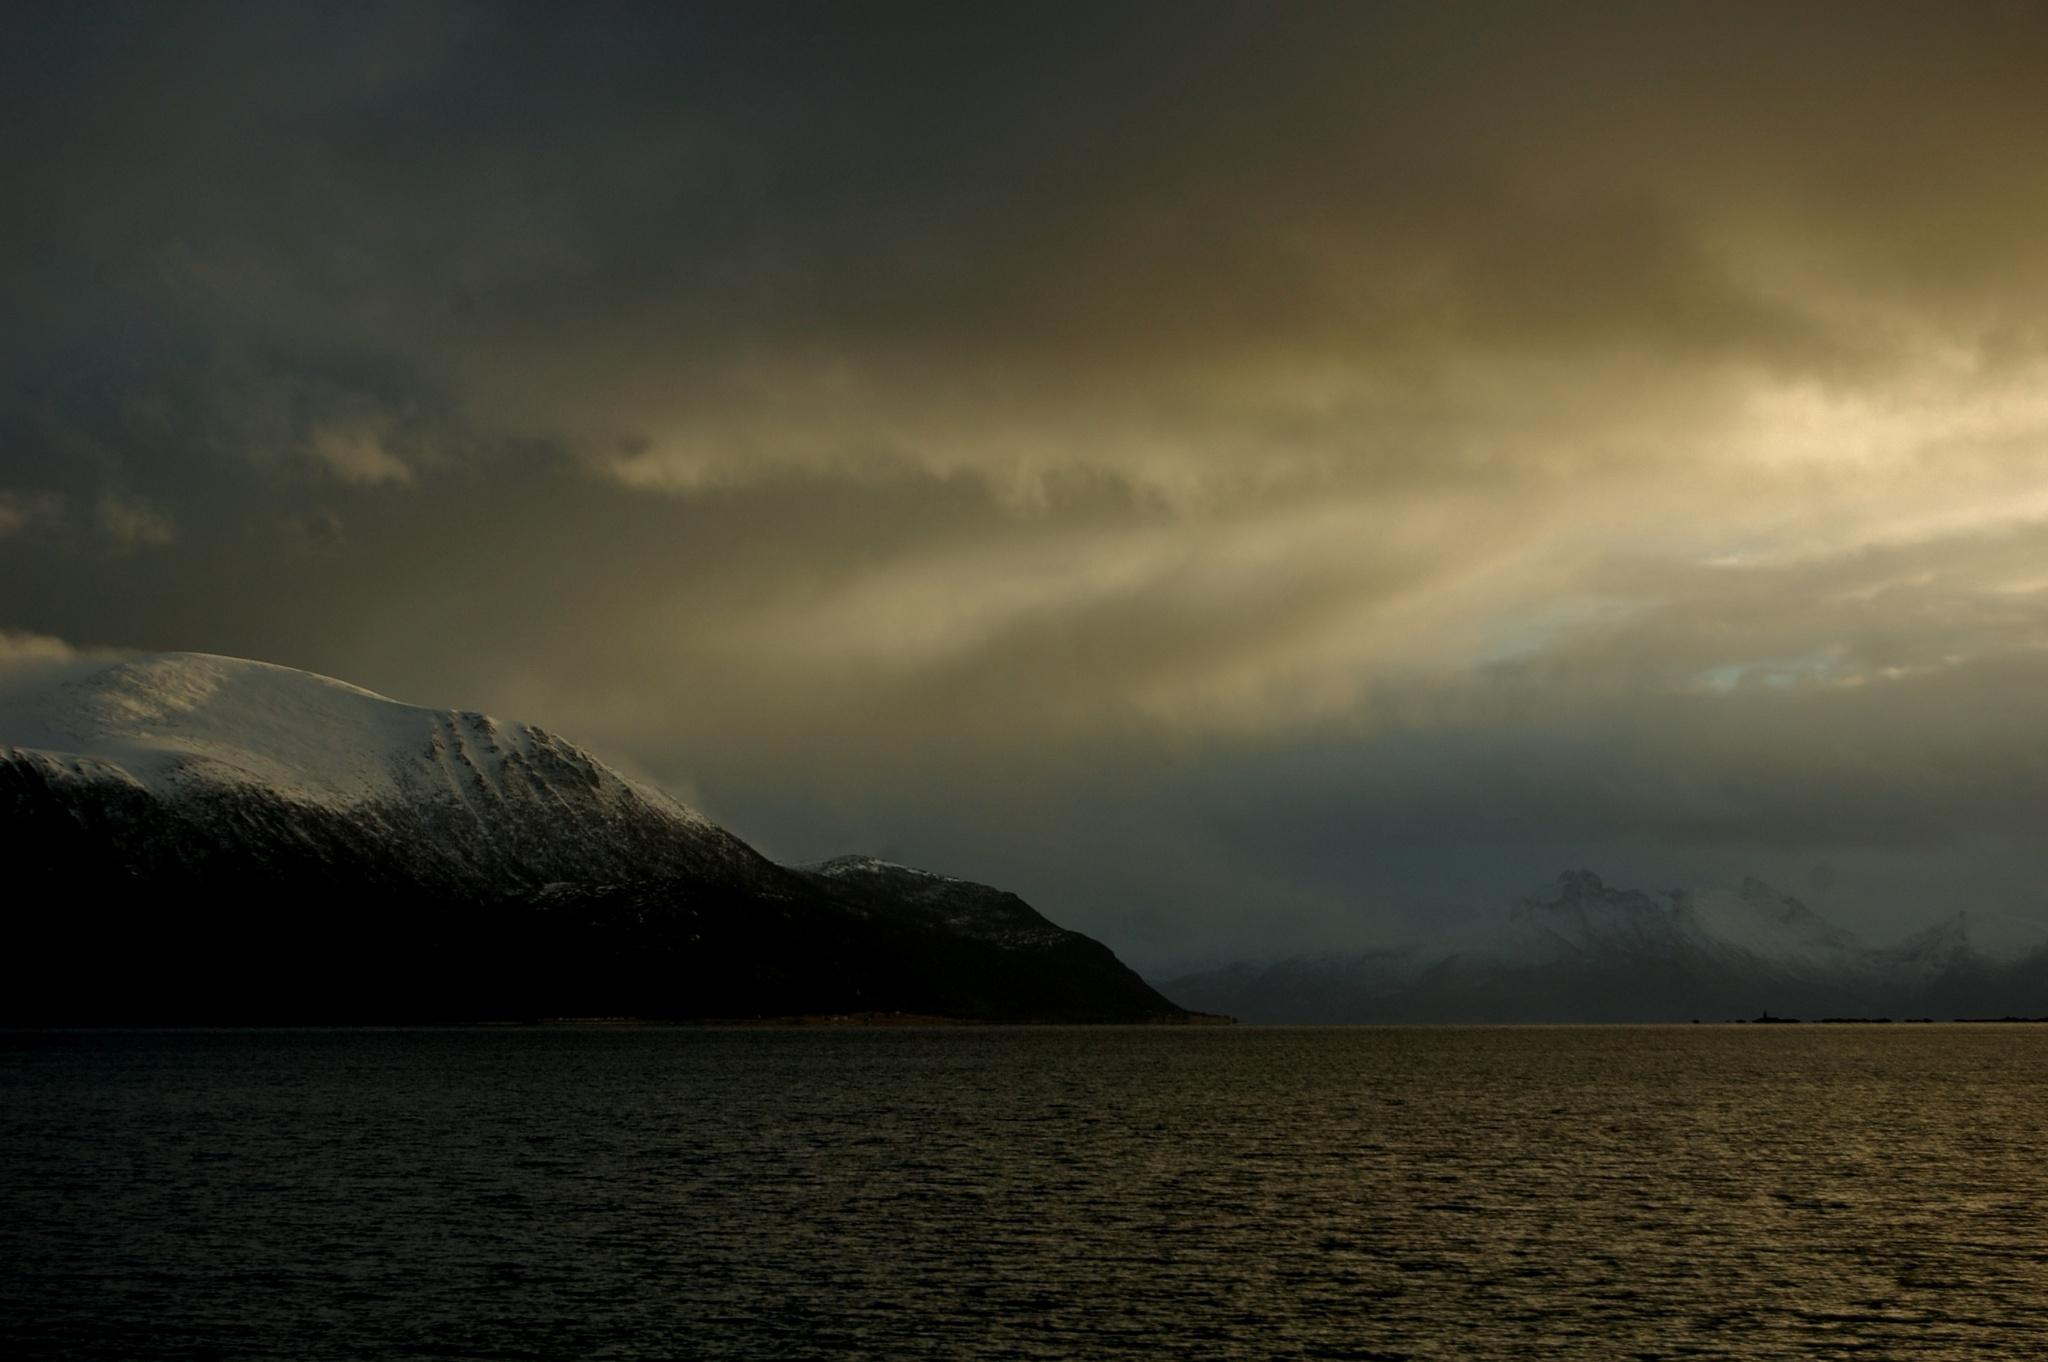 North Norway by Tea-mari Brax